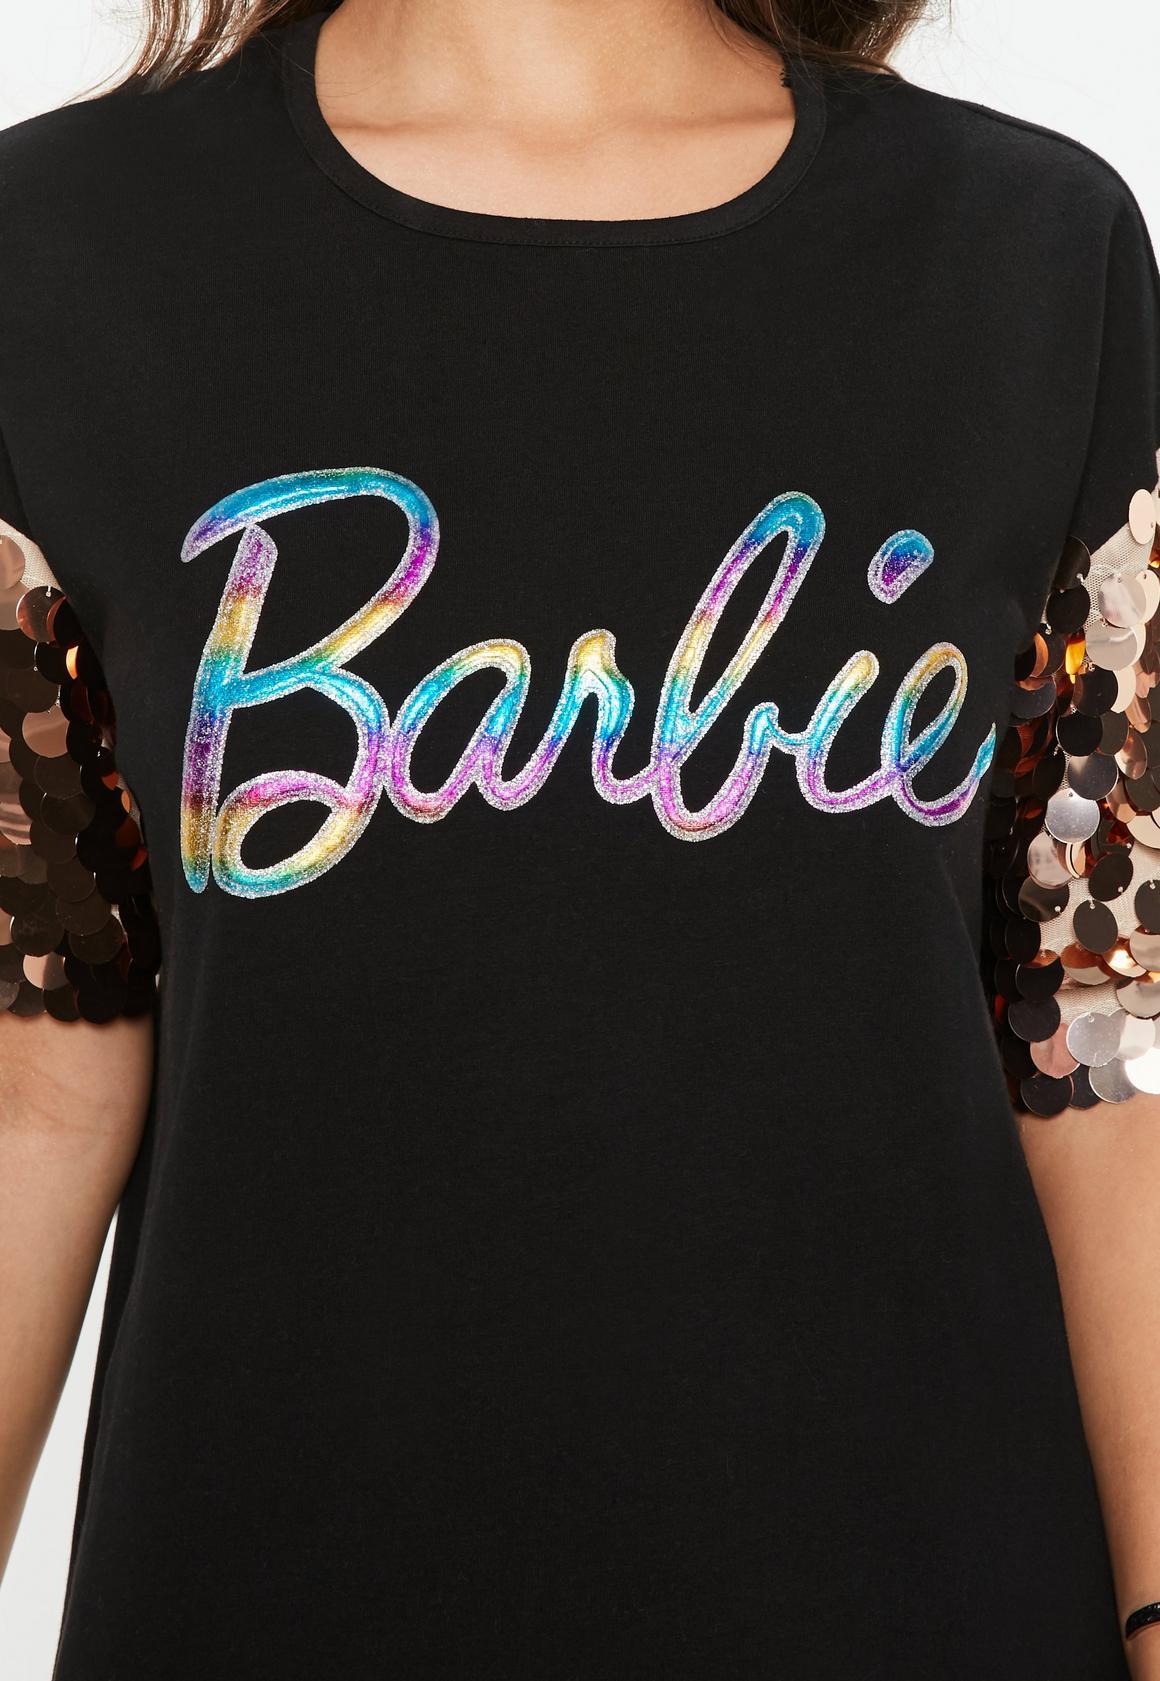 3117c4754258 Missguided - Barbie x Missguided Black Glitter Logo Sequin Sleeve T Shirt  Dress, Black -